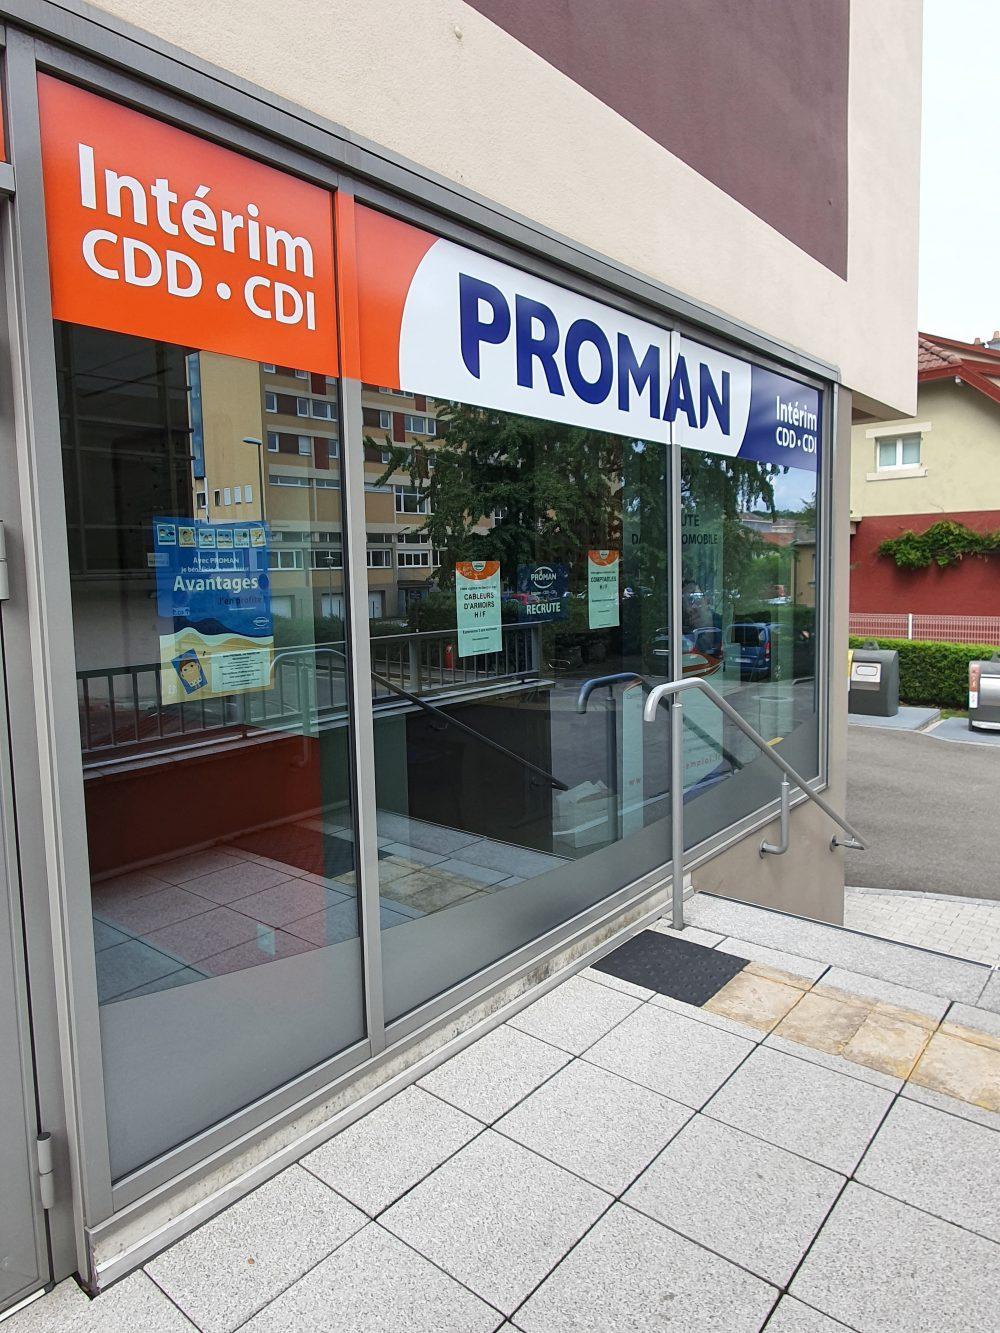 PROMAN-BELFORT-interim_cdd_cdi